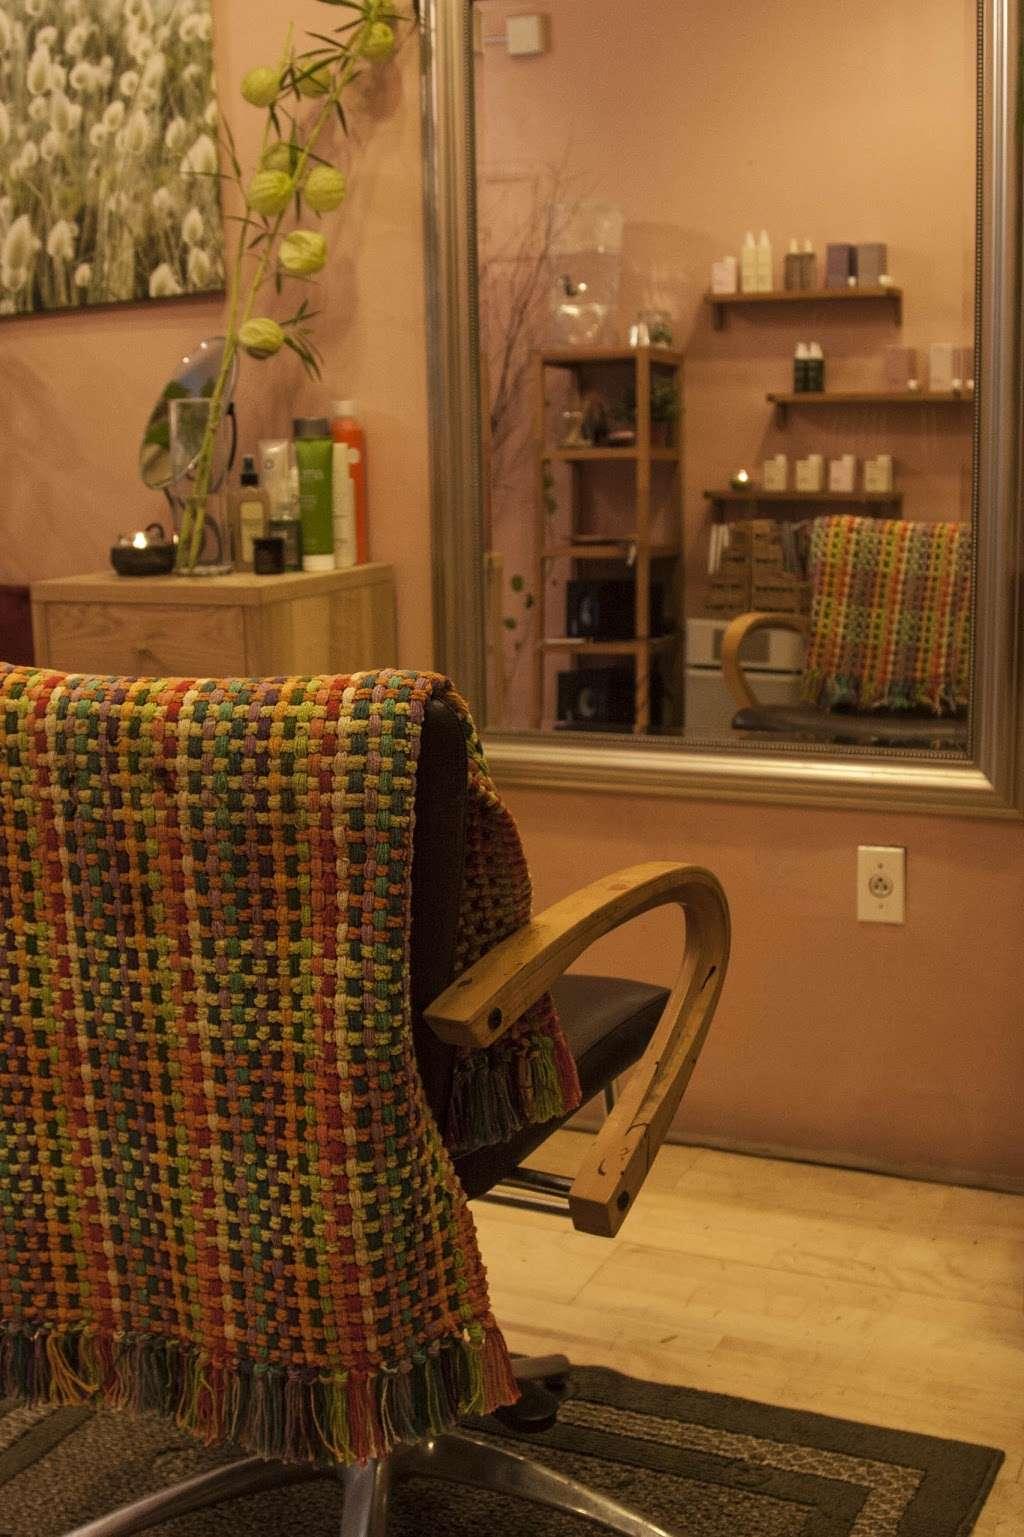 Swing Organic Salon - hair care    Photo 5 of 7   Address: 280 E 10th St, New York, NY 10009, USA   Phone: (212) 677-2008